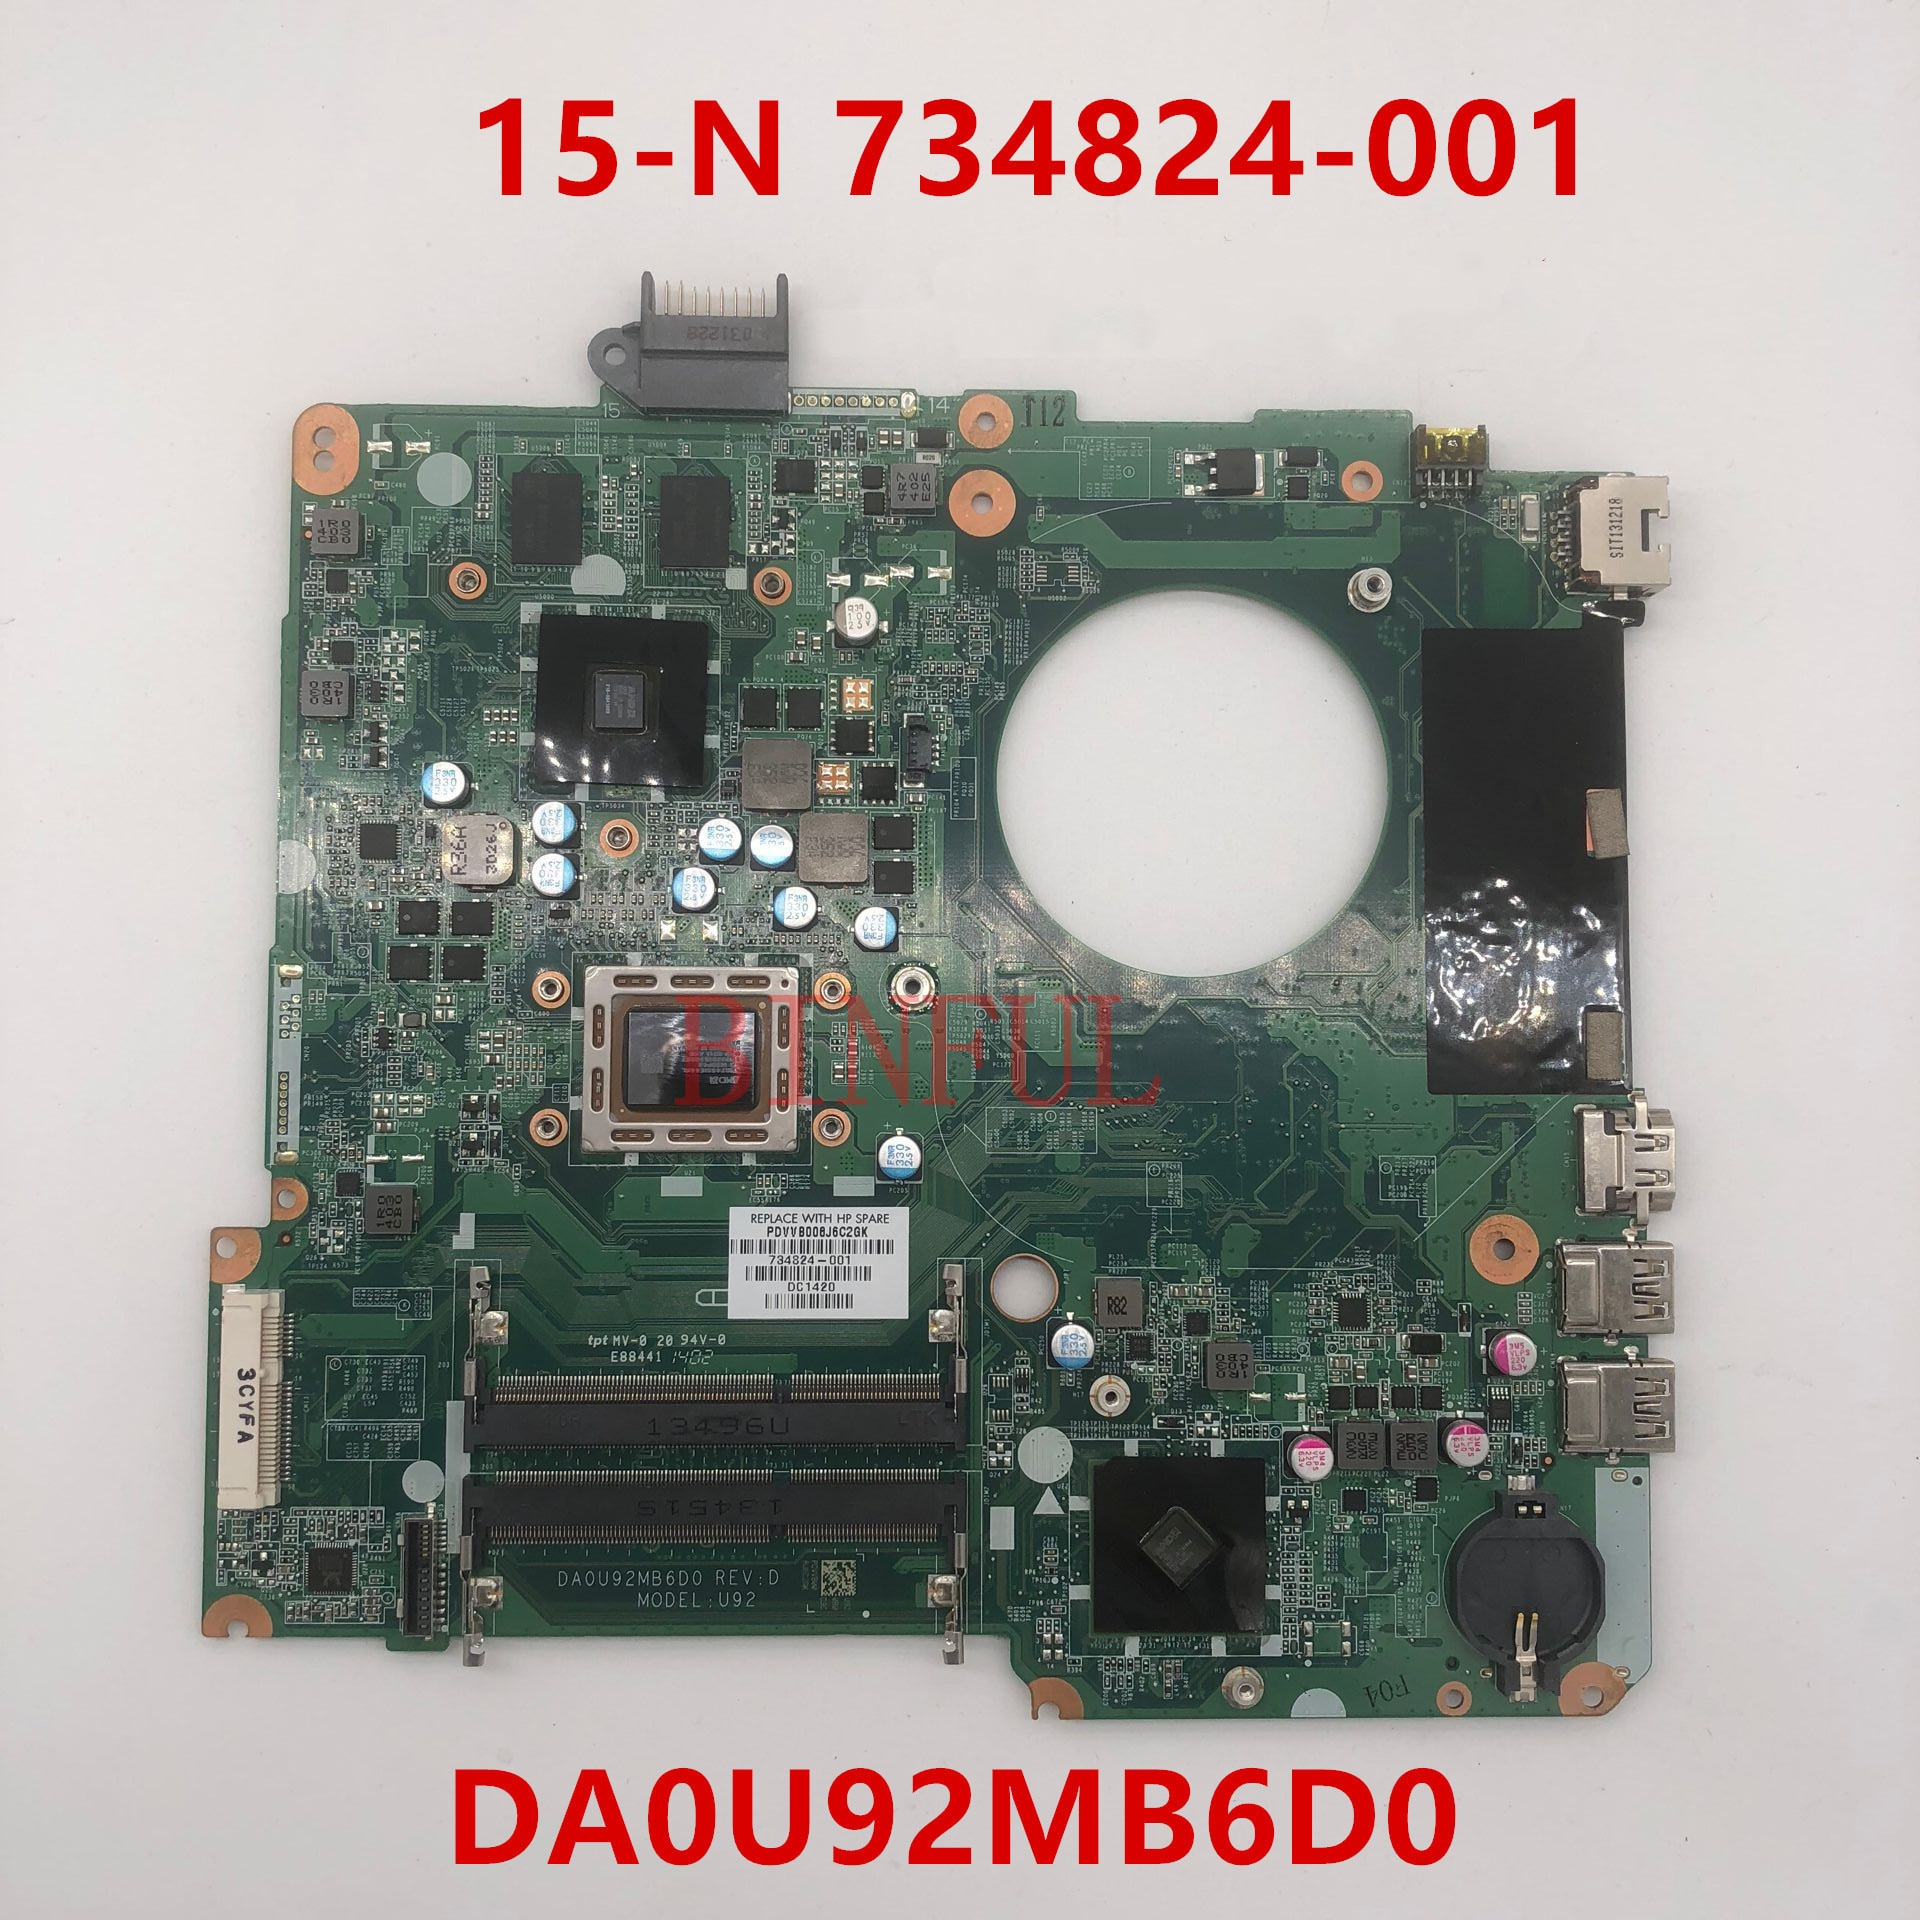 15 15-N 15Z-N 15Z-N100 15Z-N200 734824-001 734824-601 A10-5745M CPU placa base de computadora portátil DA0U92MB6D0 8670M 100% prueba completa de trabajo